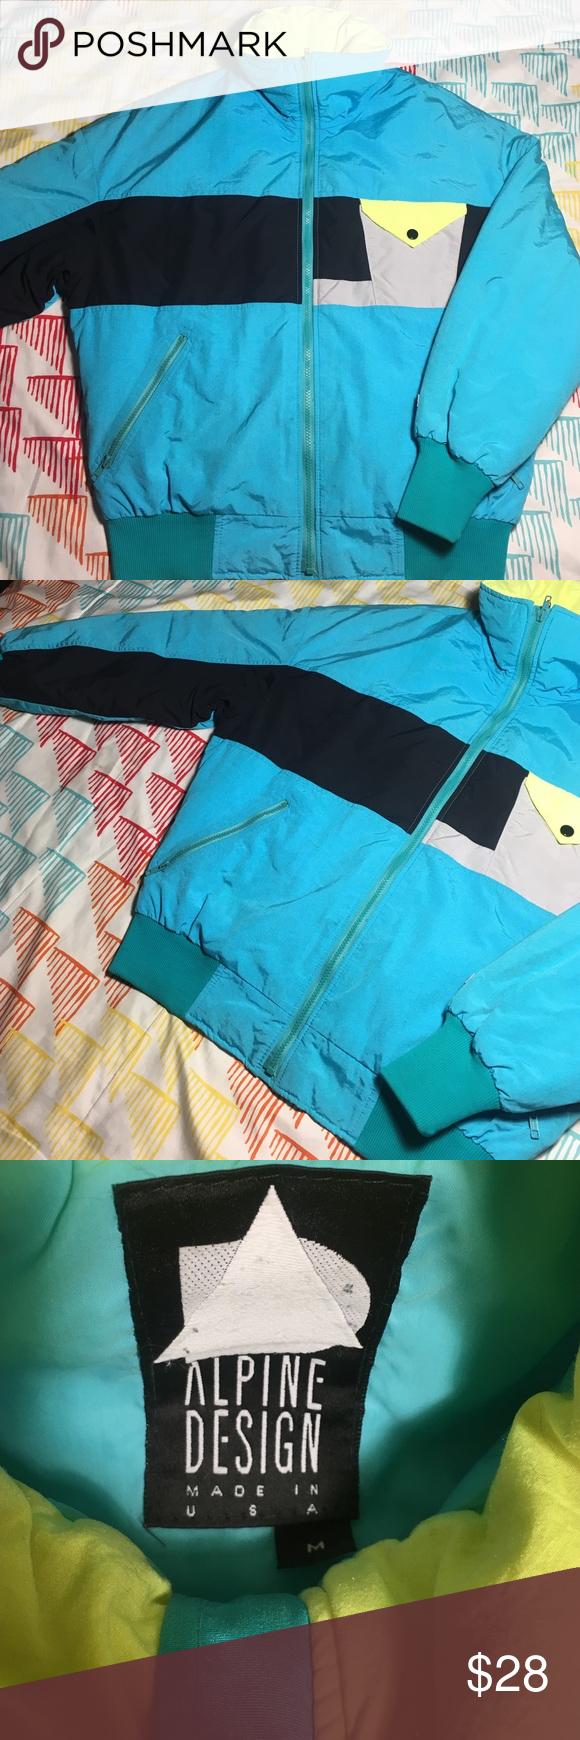 Alpine Design Retro Down Ski Jacket Vintage 90s Size Medium - Condition 9/10 alpine design Jackets & Coats